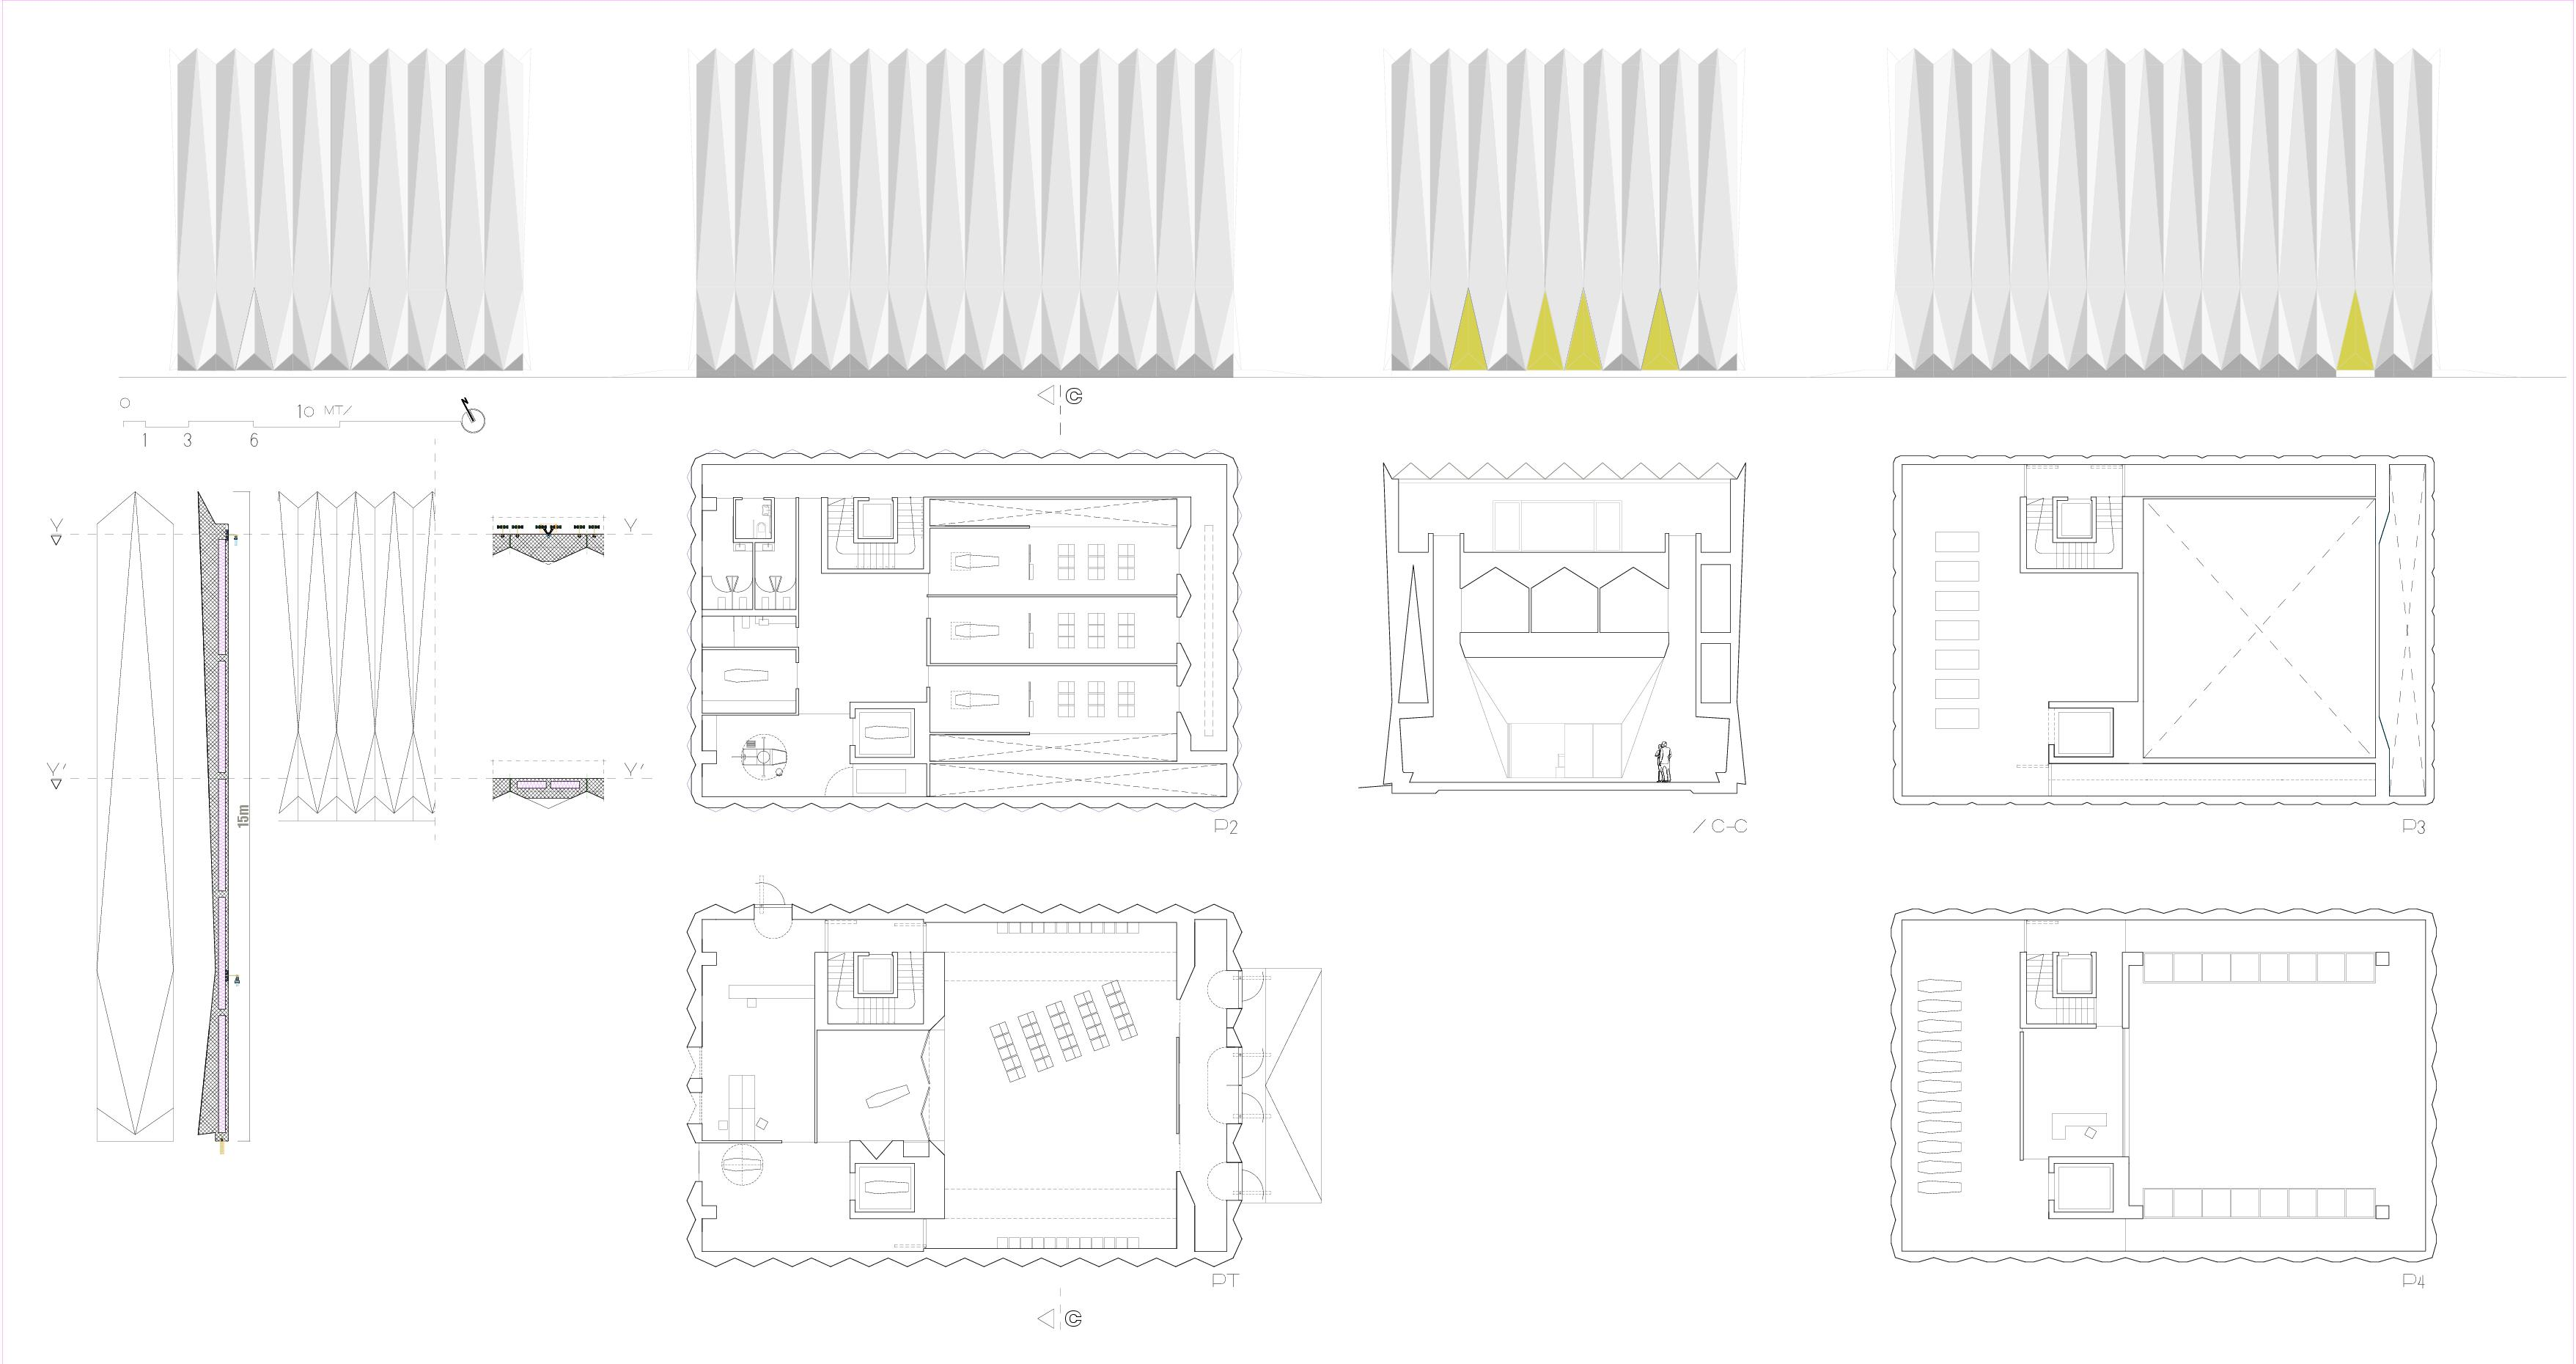 Grundrisse, Schnitte und Fassade Centro Funerario Bellinzona - CAFUBE SA von Studio d'architettura<br/>